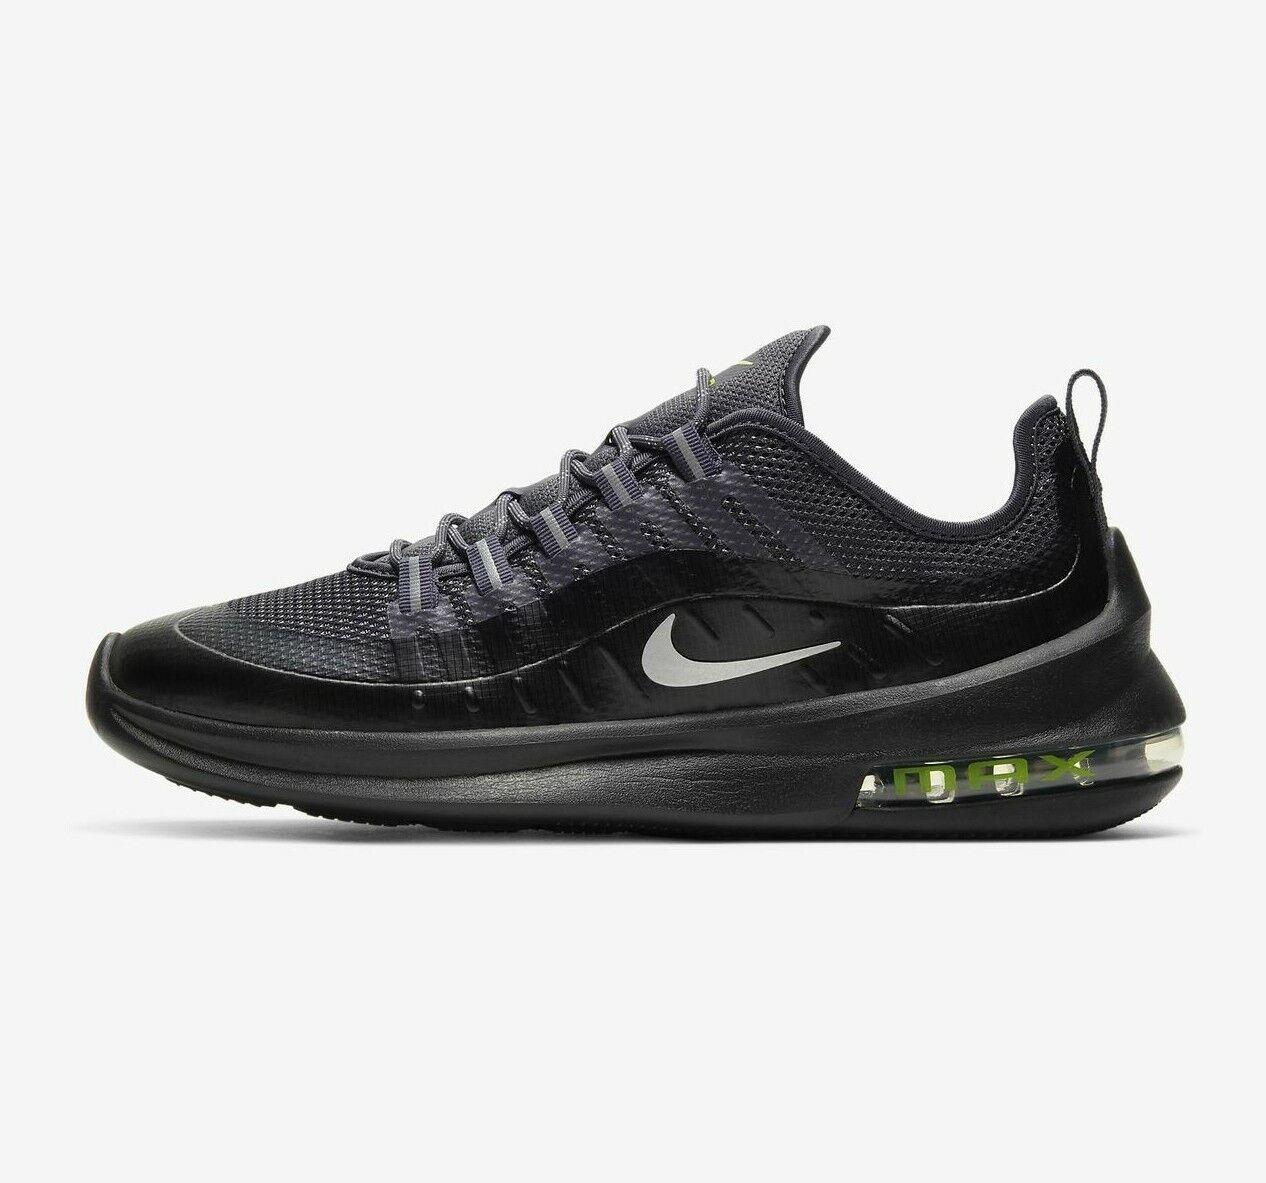 Nike Air Max Axis Prem Thunder Grey Silver AA2148-009 Running Shoes Men's  NEW